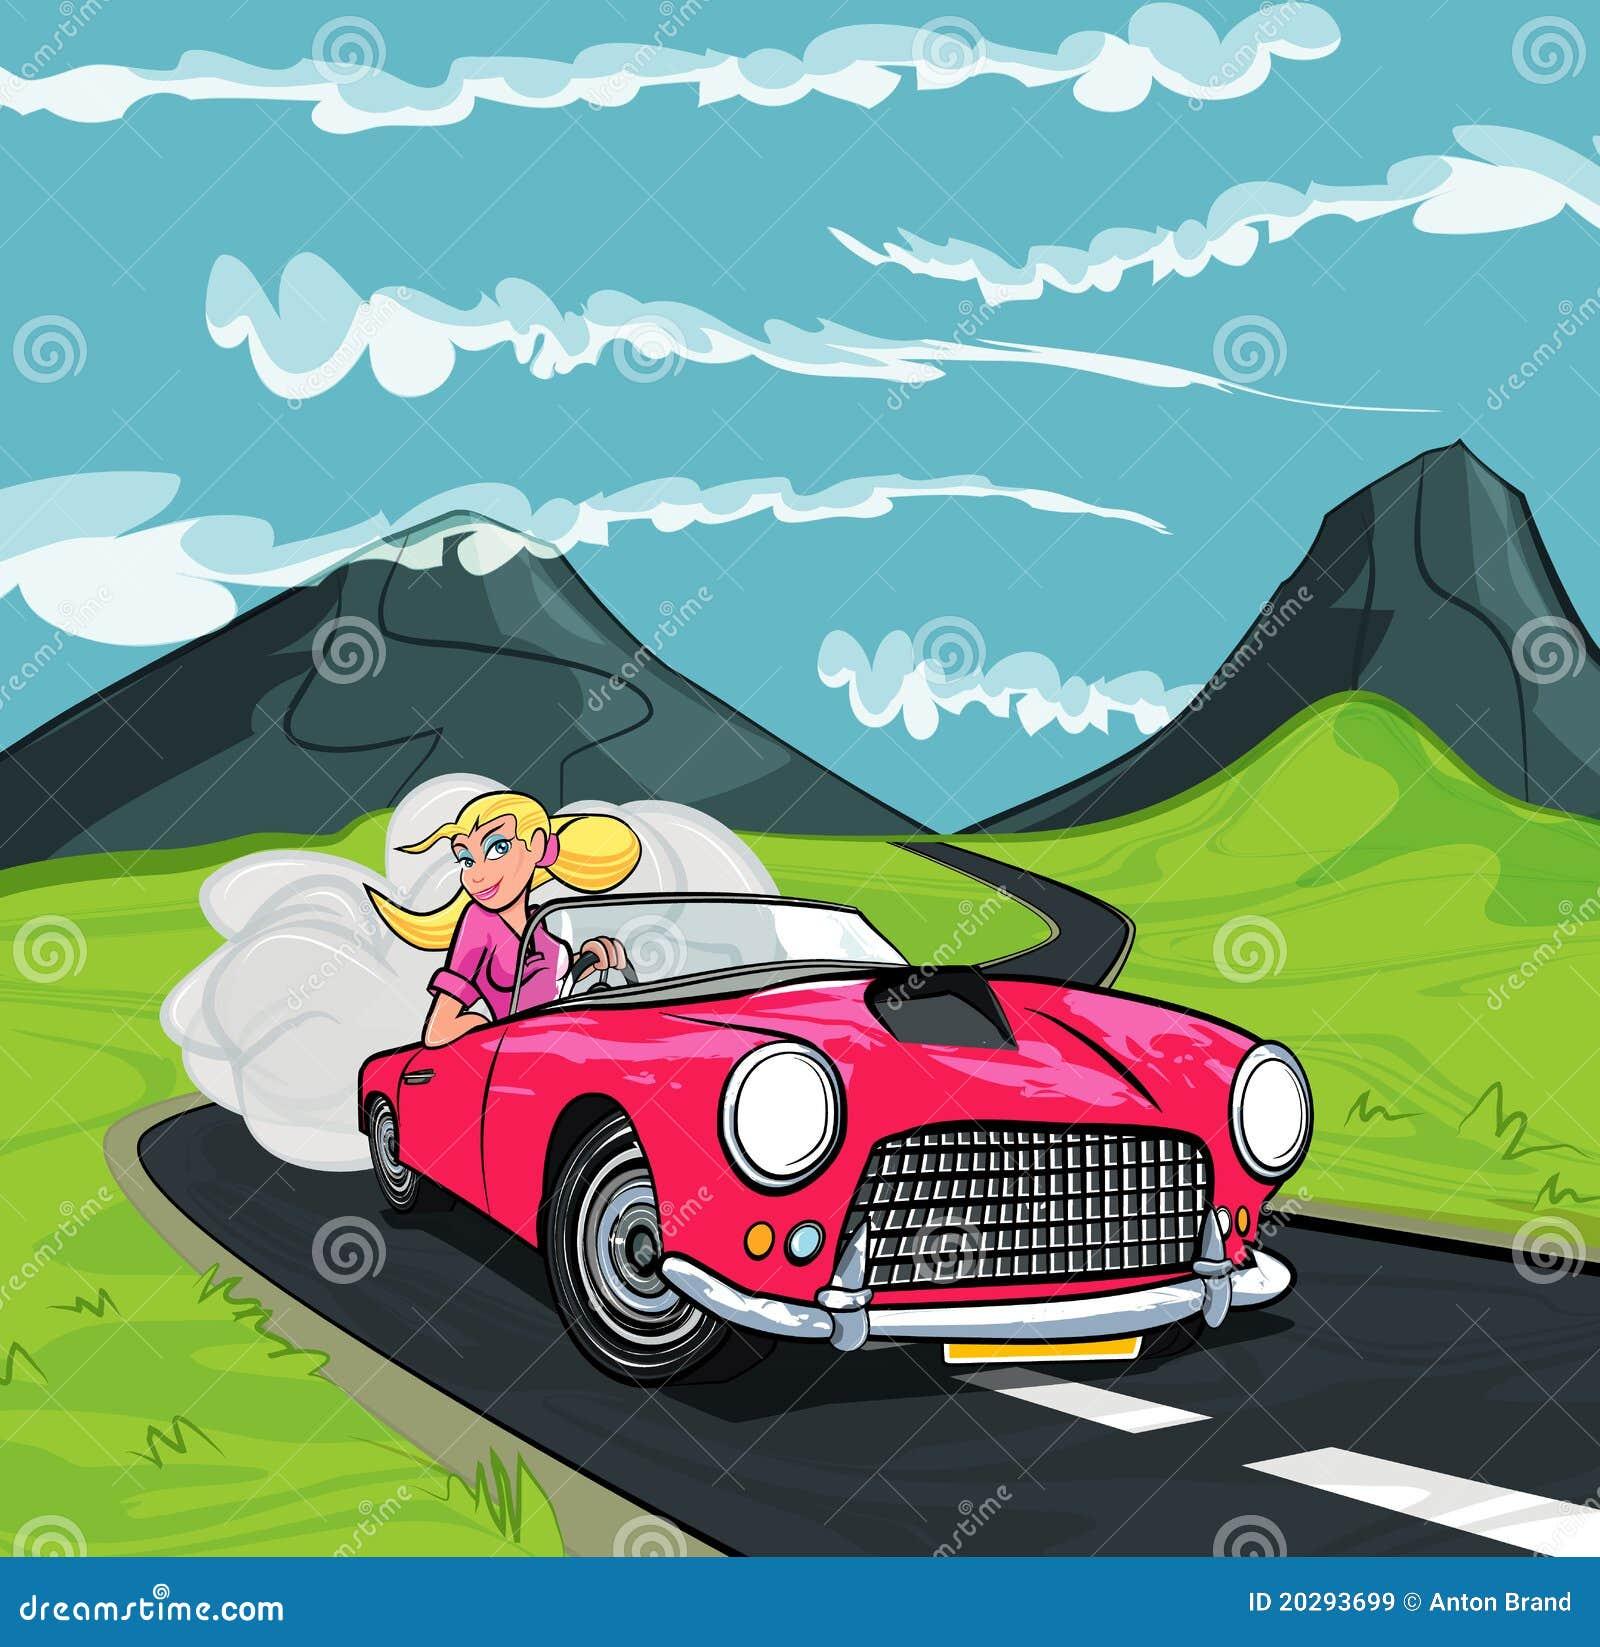 clipart voiture sport - photo #45